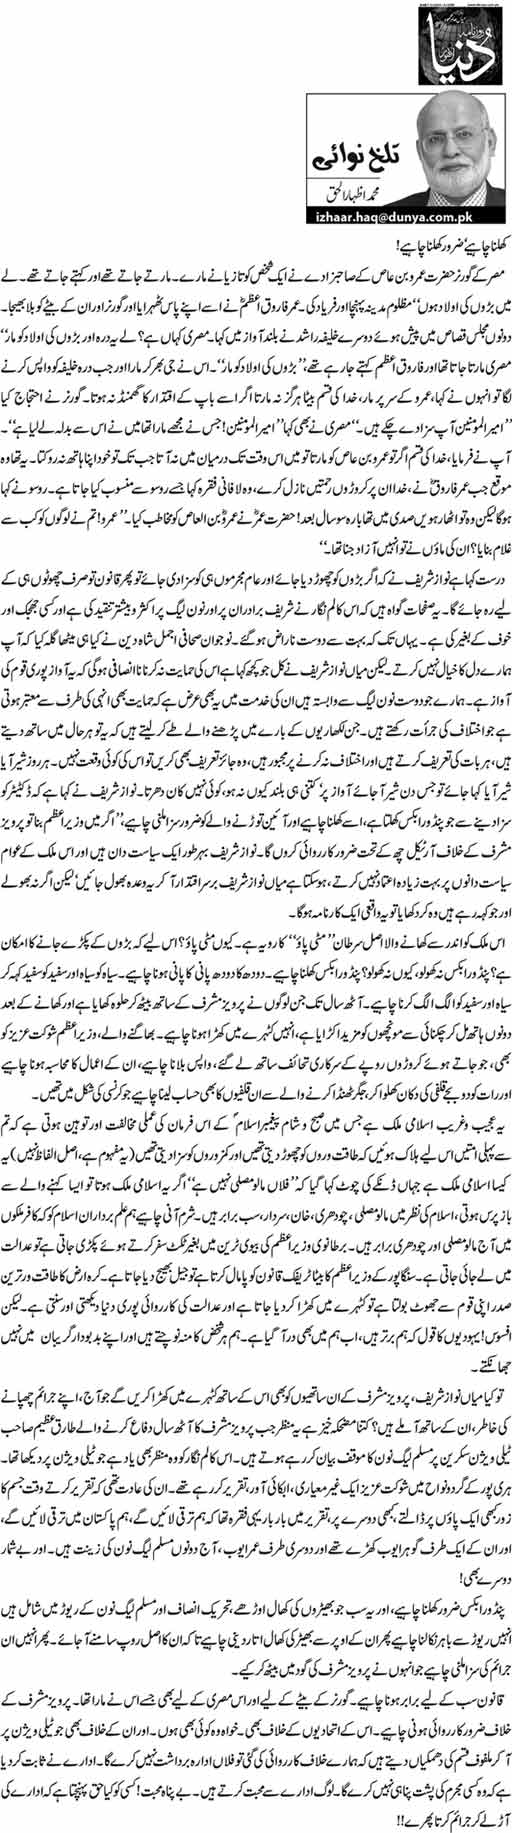 Khulna Chahiye' Zaroor Khulna Chahiye! - M. Izhar ul Haq